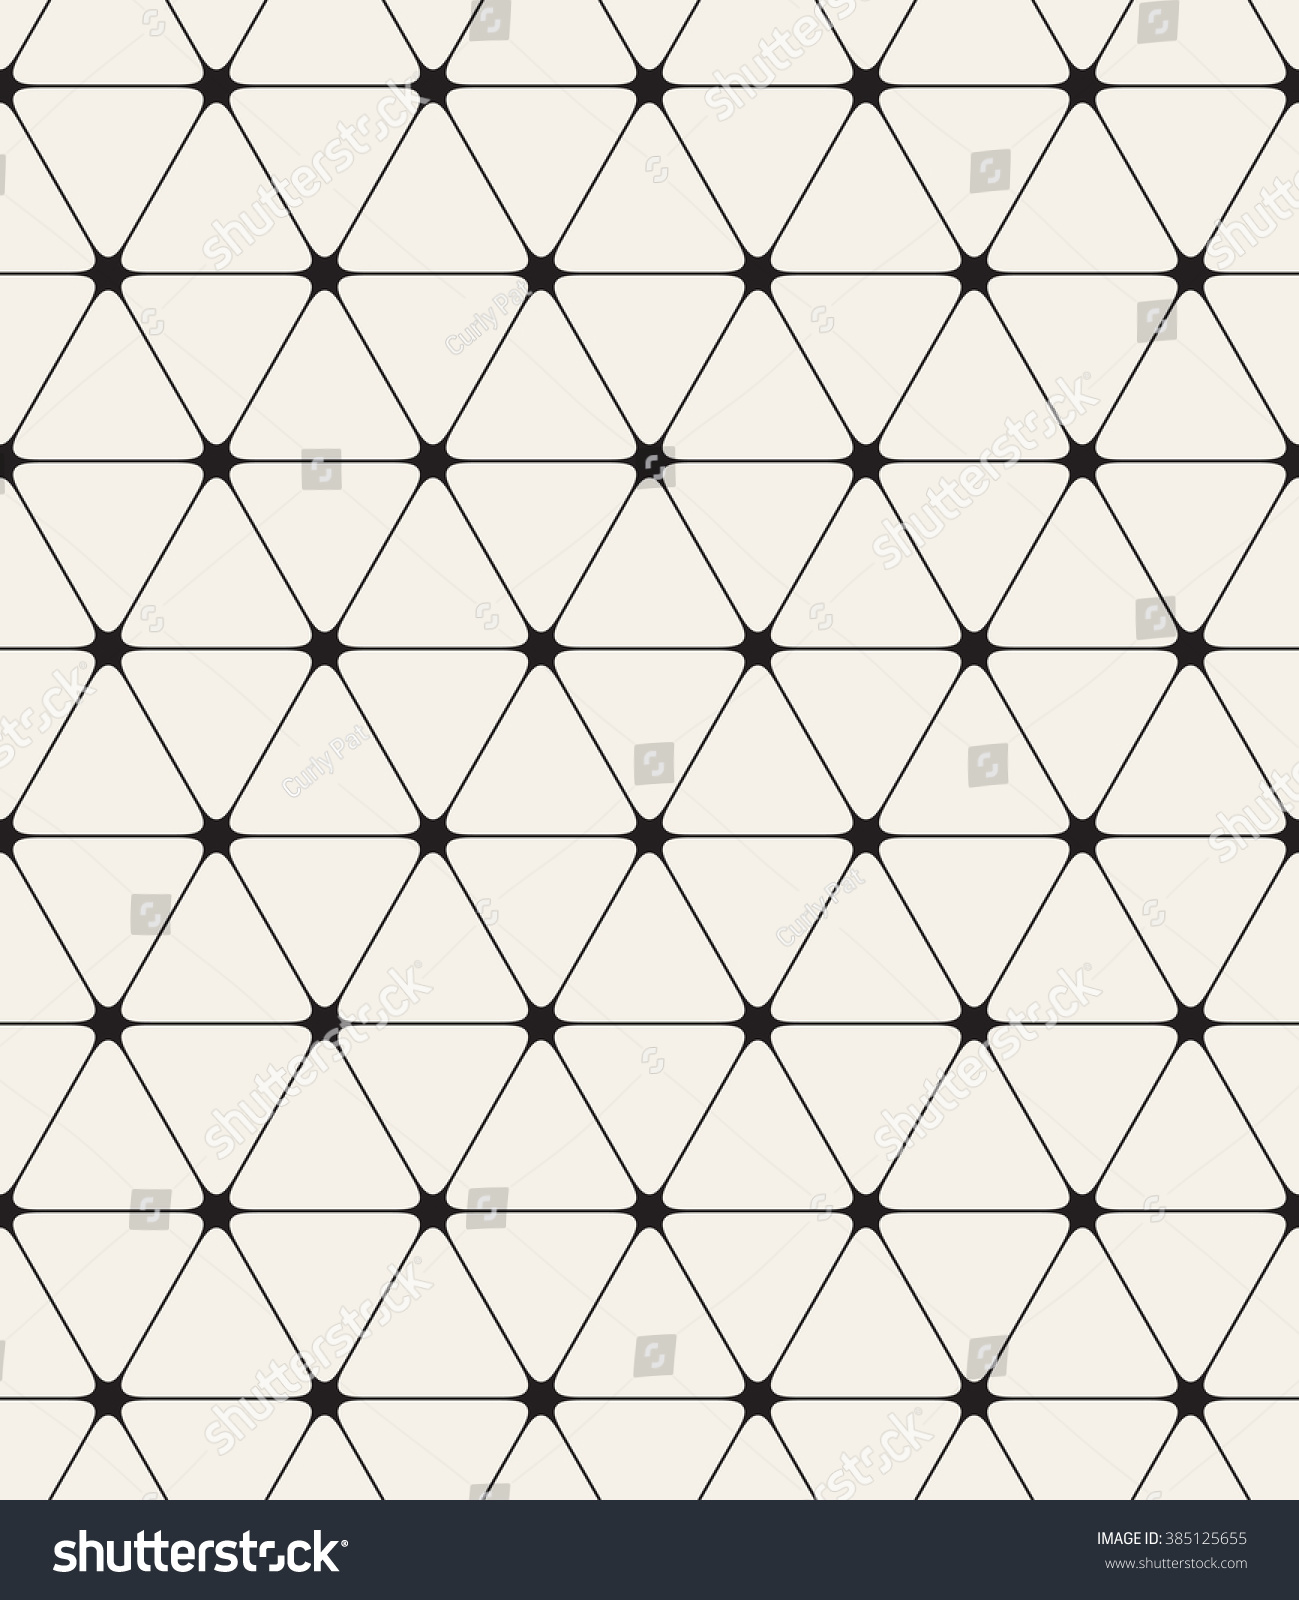 Vector pattern generator